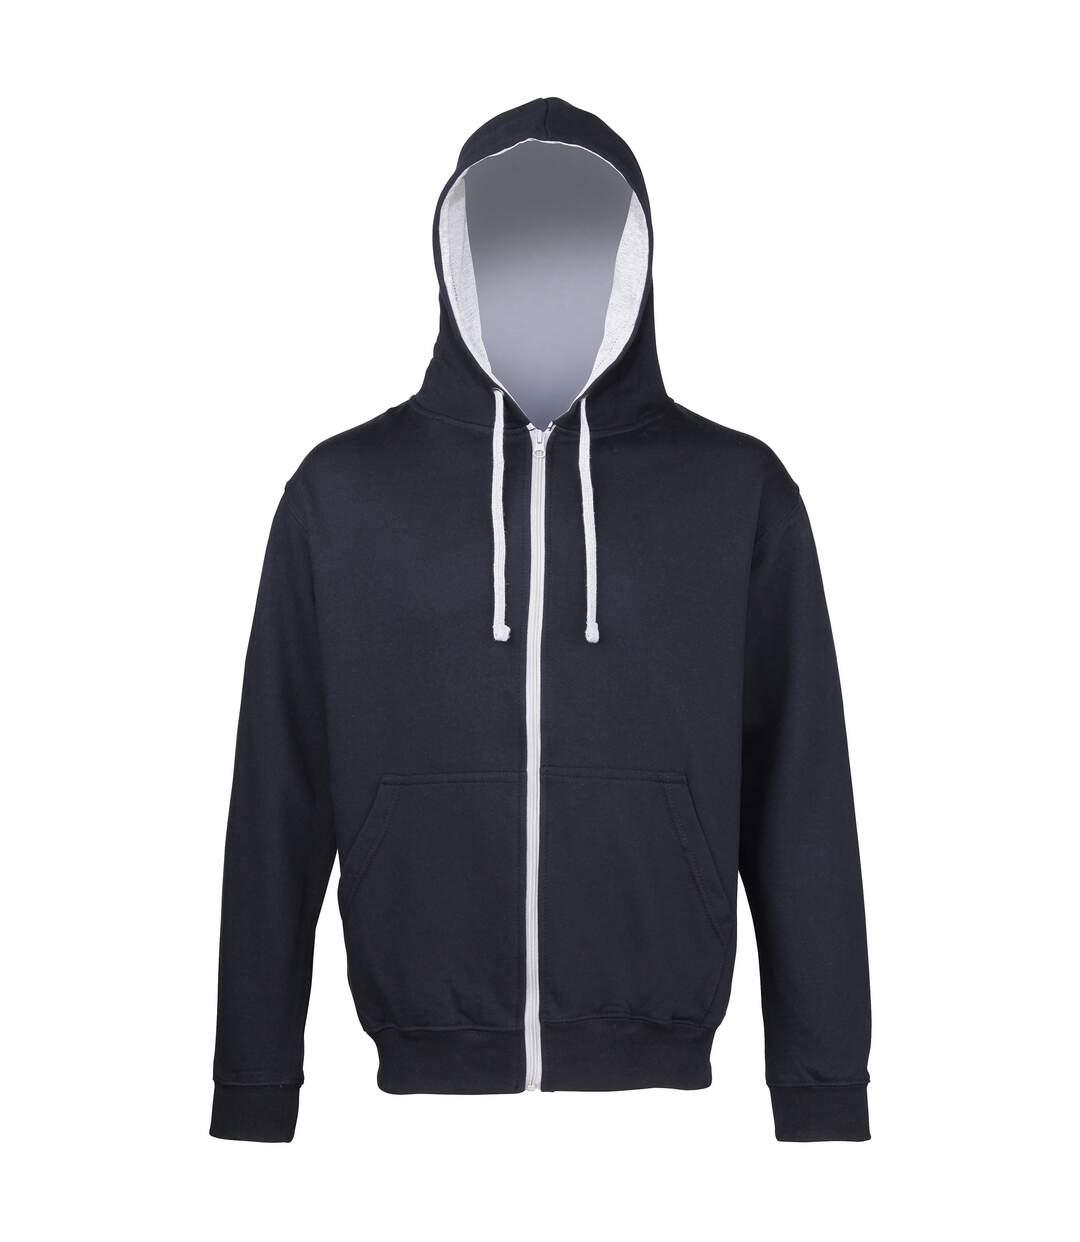 Awdis Mens Varsity Hooded Sweatshirt / Hoodie / Zoodie (Heather Grey/French Navy) - UTRW182